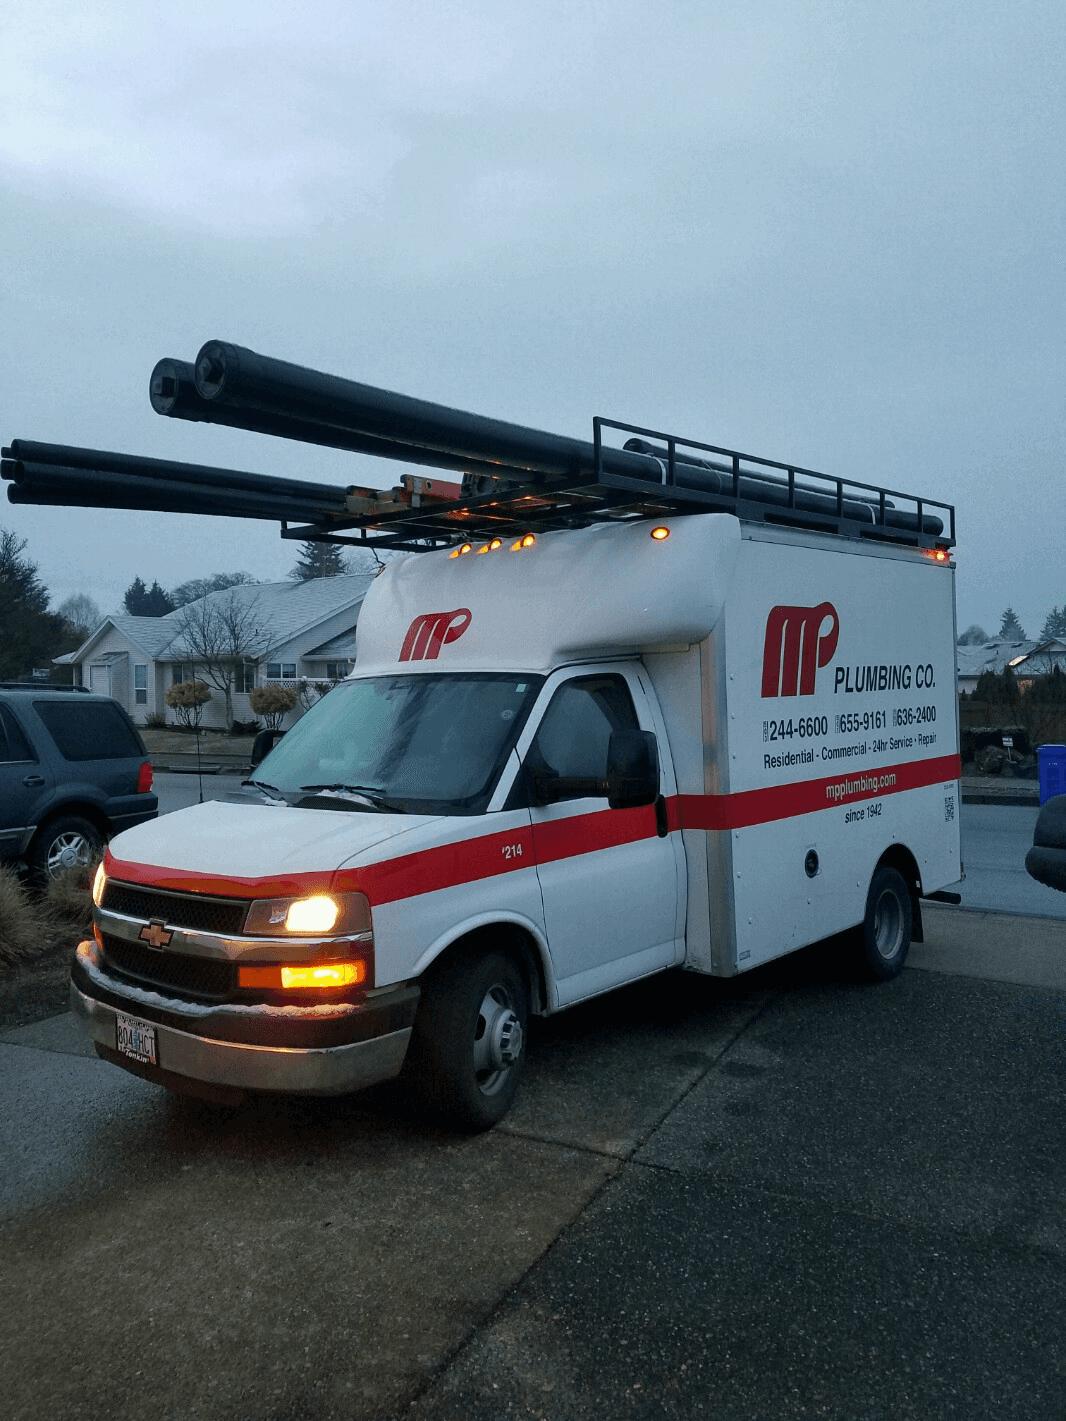 M P Plumbing Truck